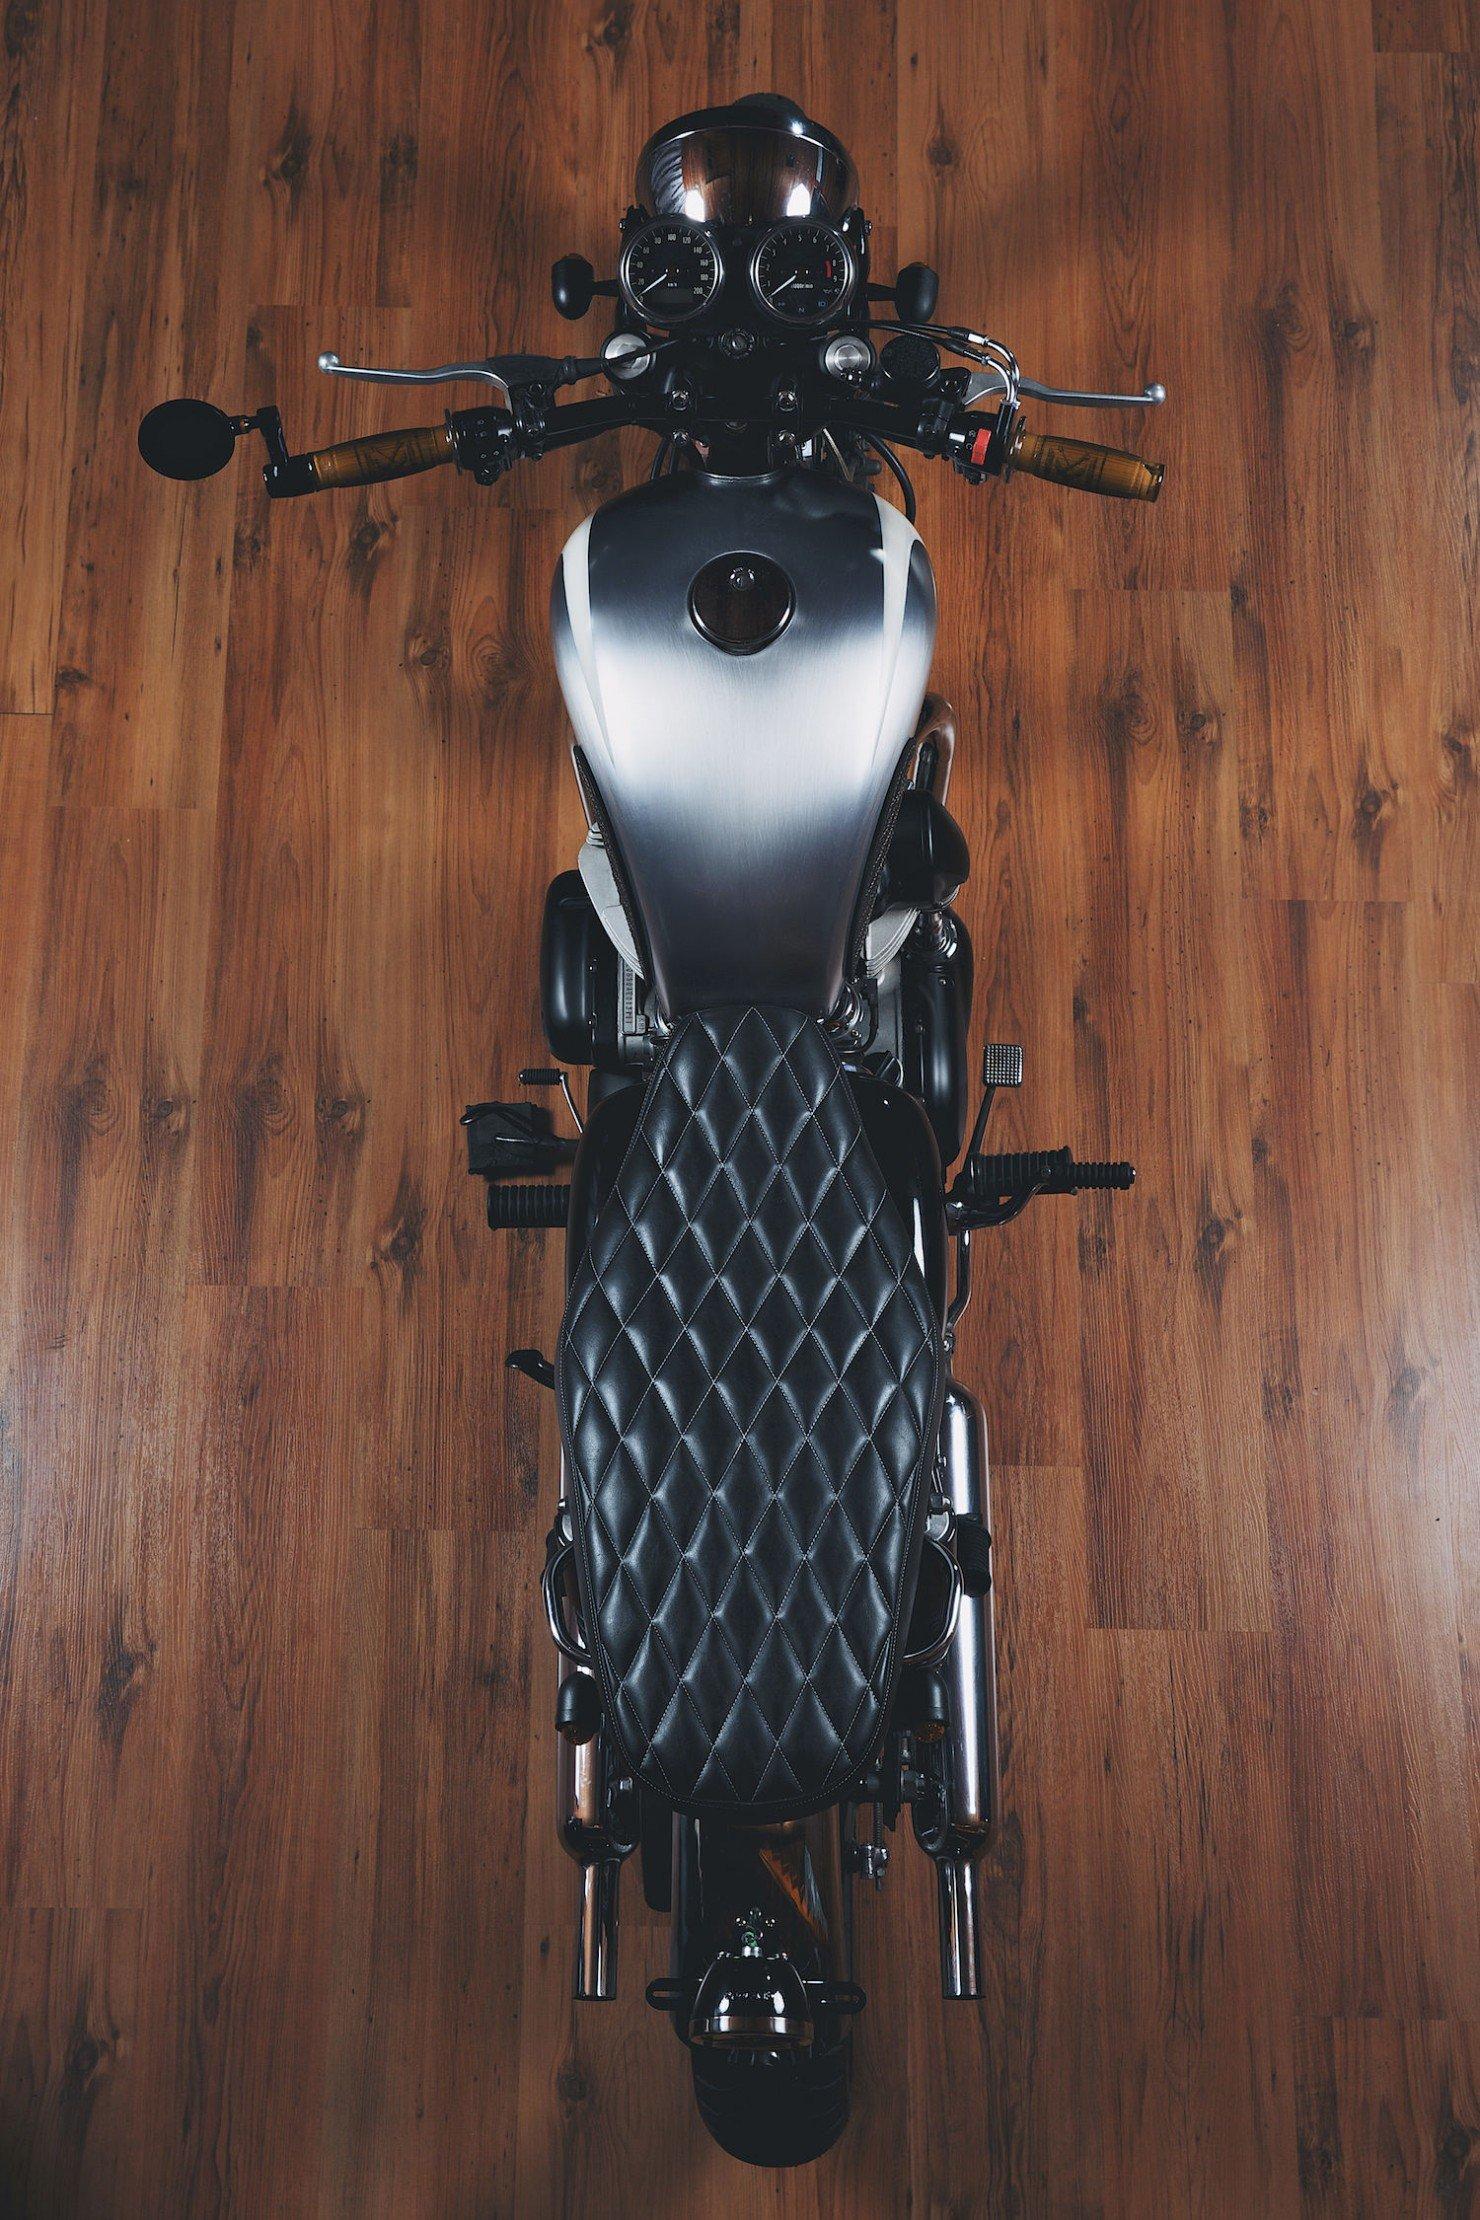 Kawasaki W650 Motorcycle 15 1480x2220 Kawasaki W650